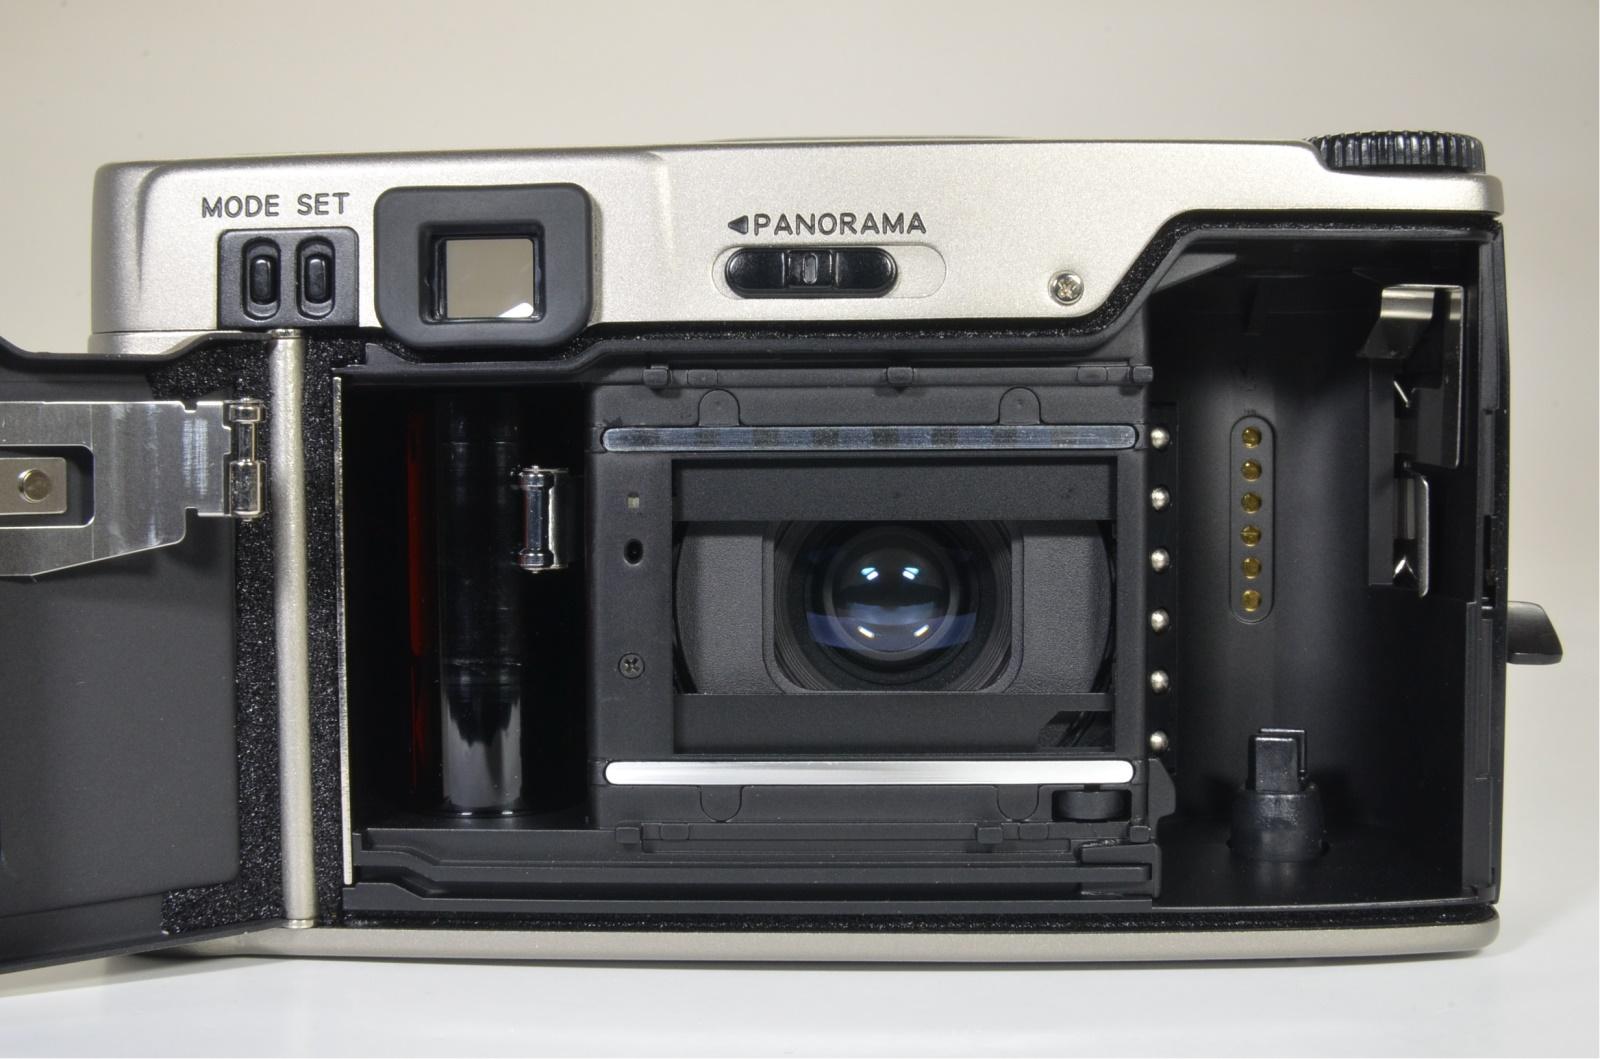 nikon 35ti p&s film camera lens 35mm f2.8 from japan film tested